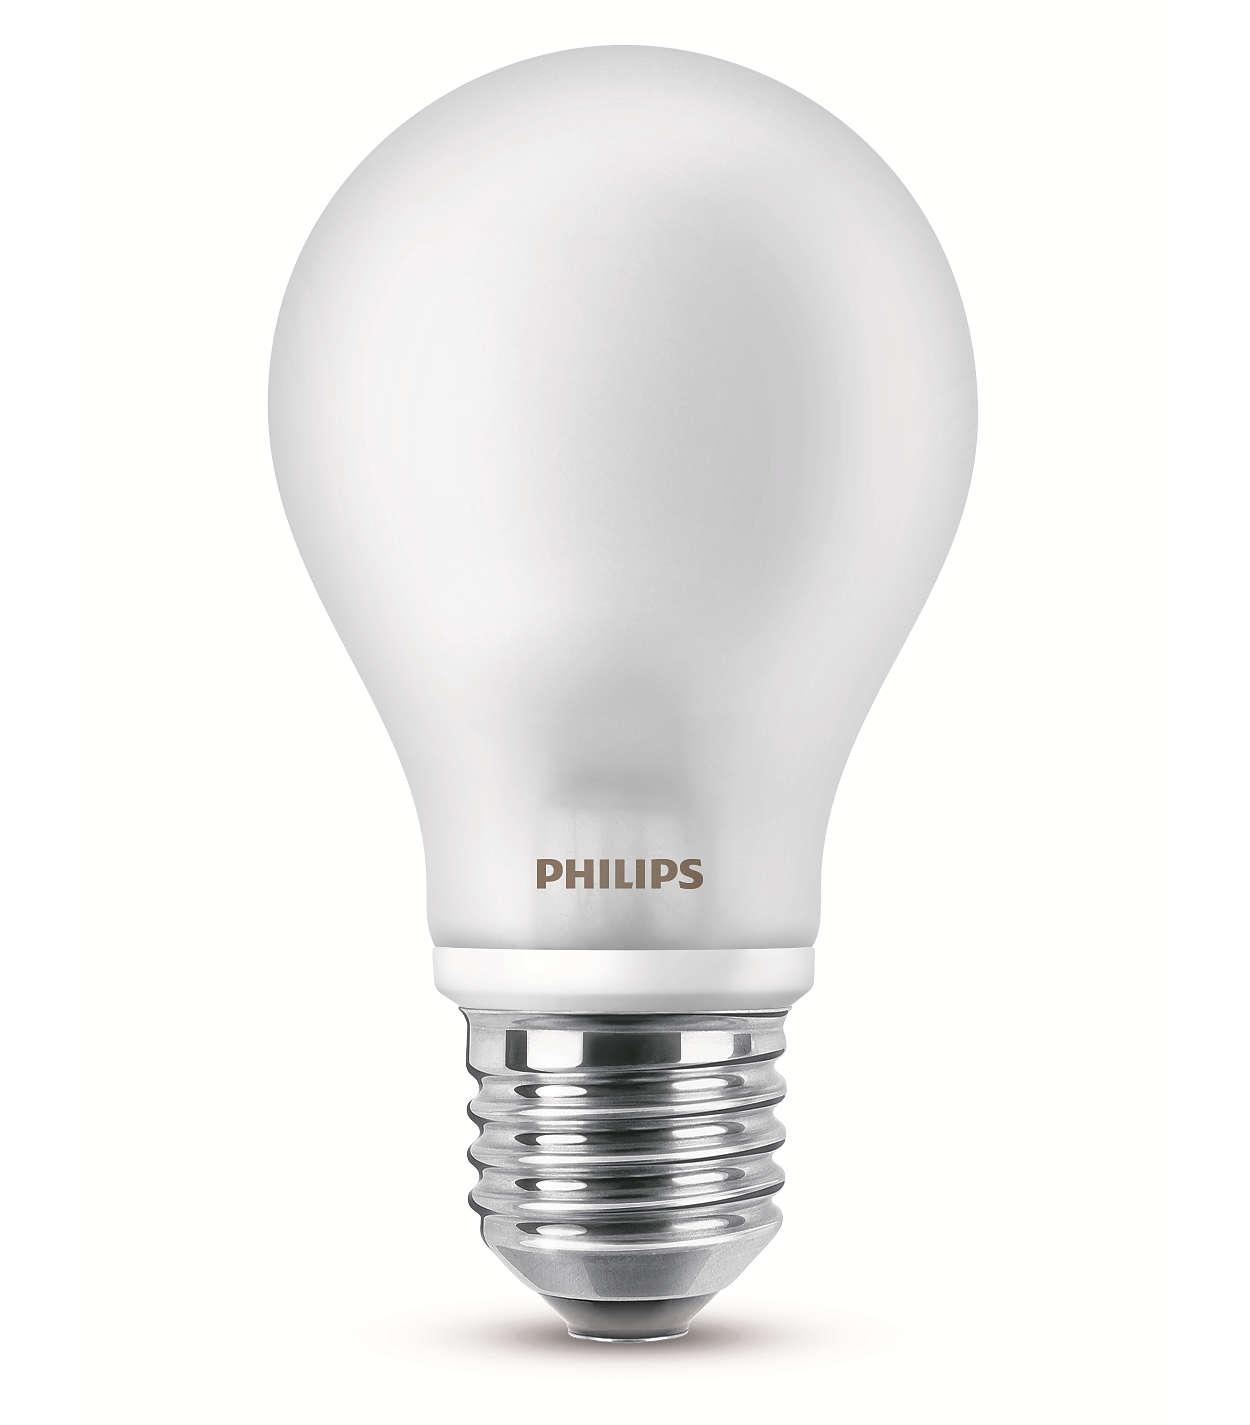 Det er LED og det er klassisk